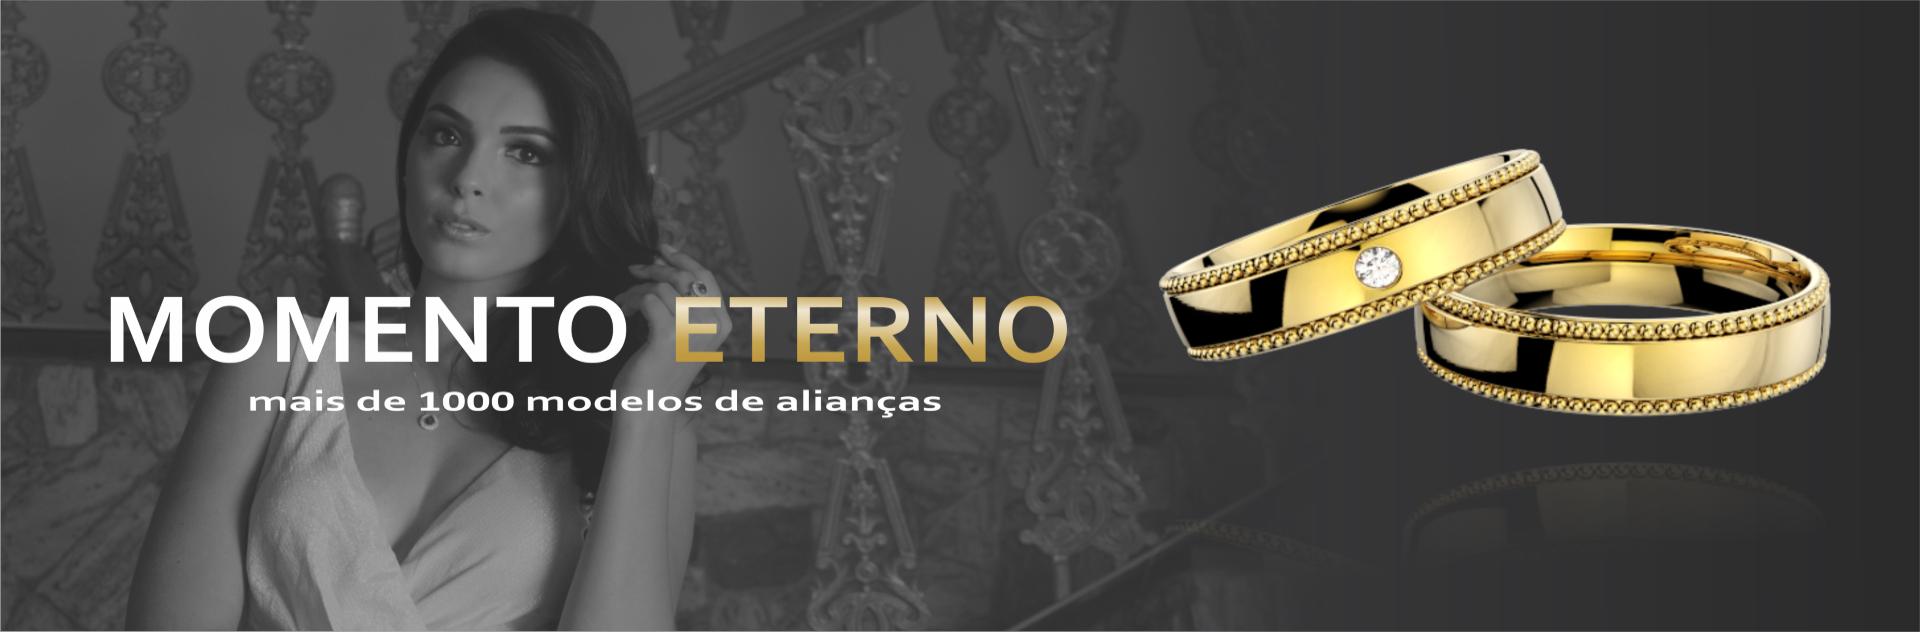 banner01ciadaalianca